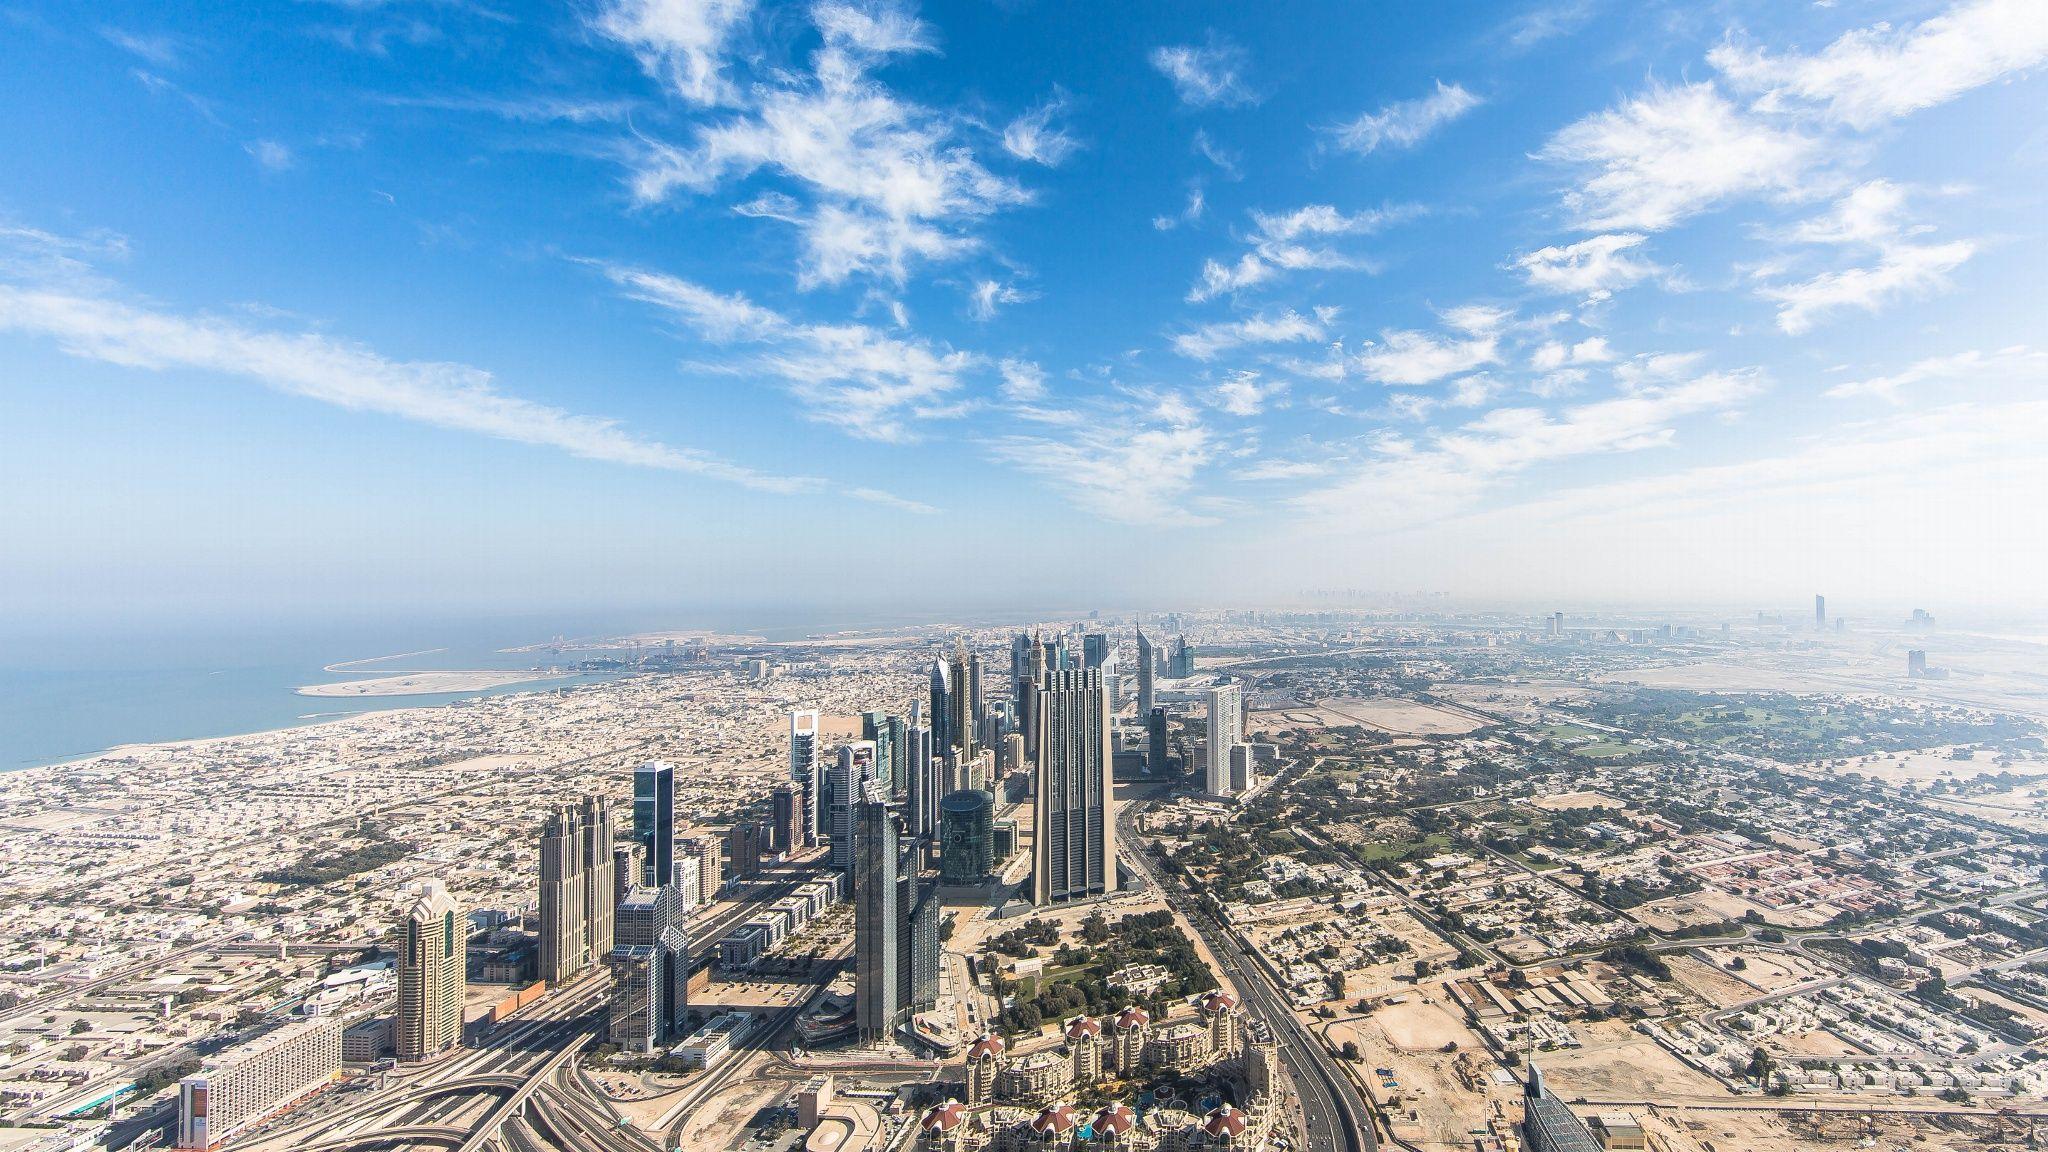 Dubaï City - Burj Khalifa by Hani Kanaftchian Photography on 500px